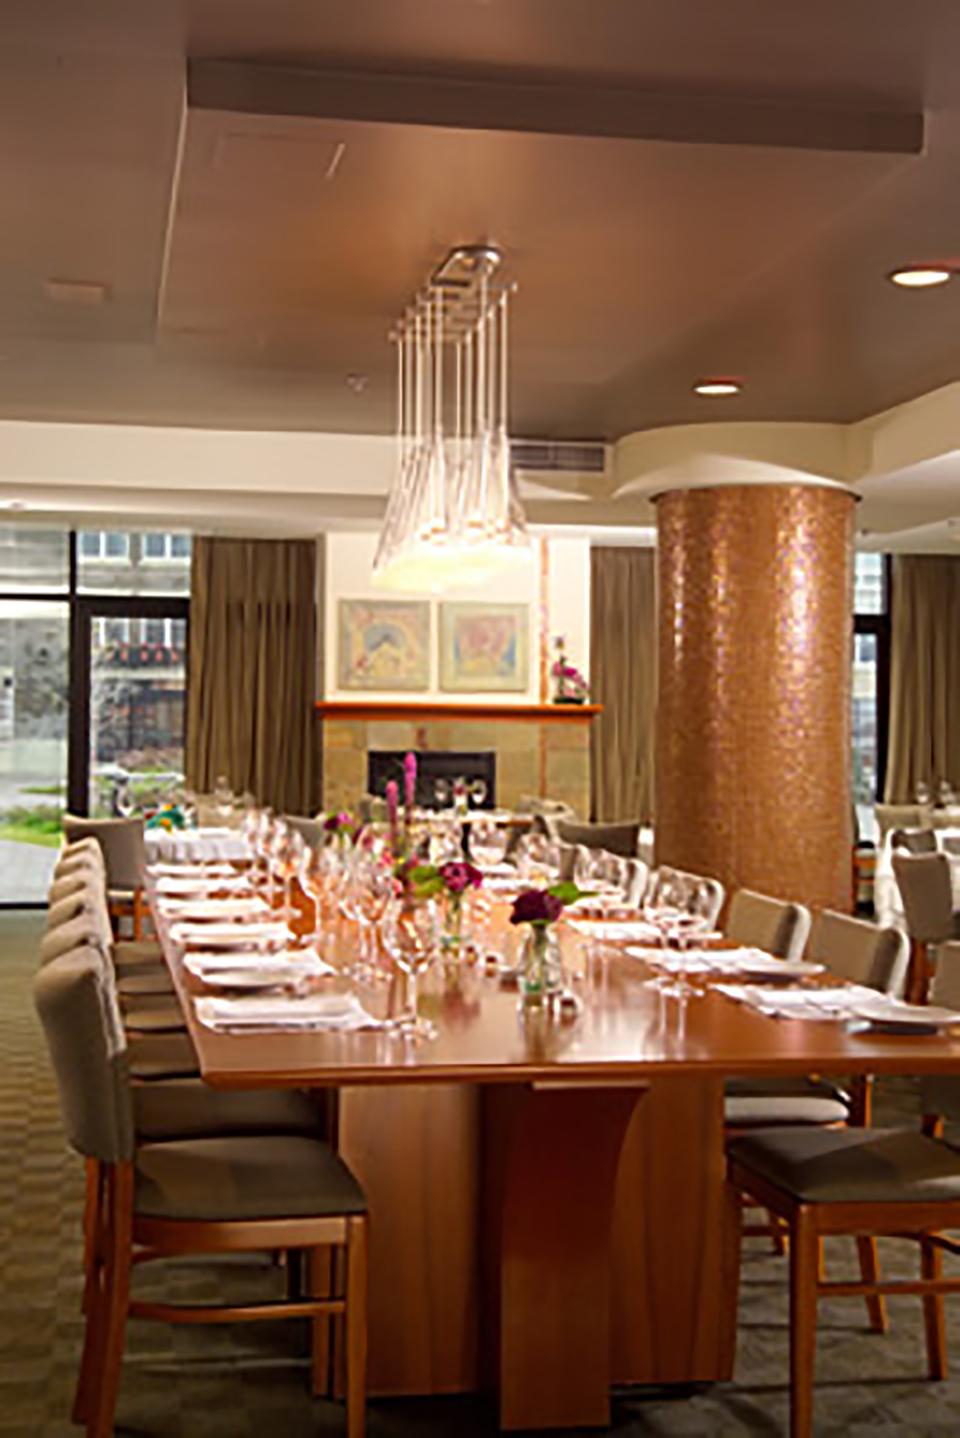 bish world cuisine mac interior design interior design halifax nova scotia. Black Bedroom Furniture Sets. Home Design Ideas